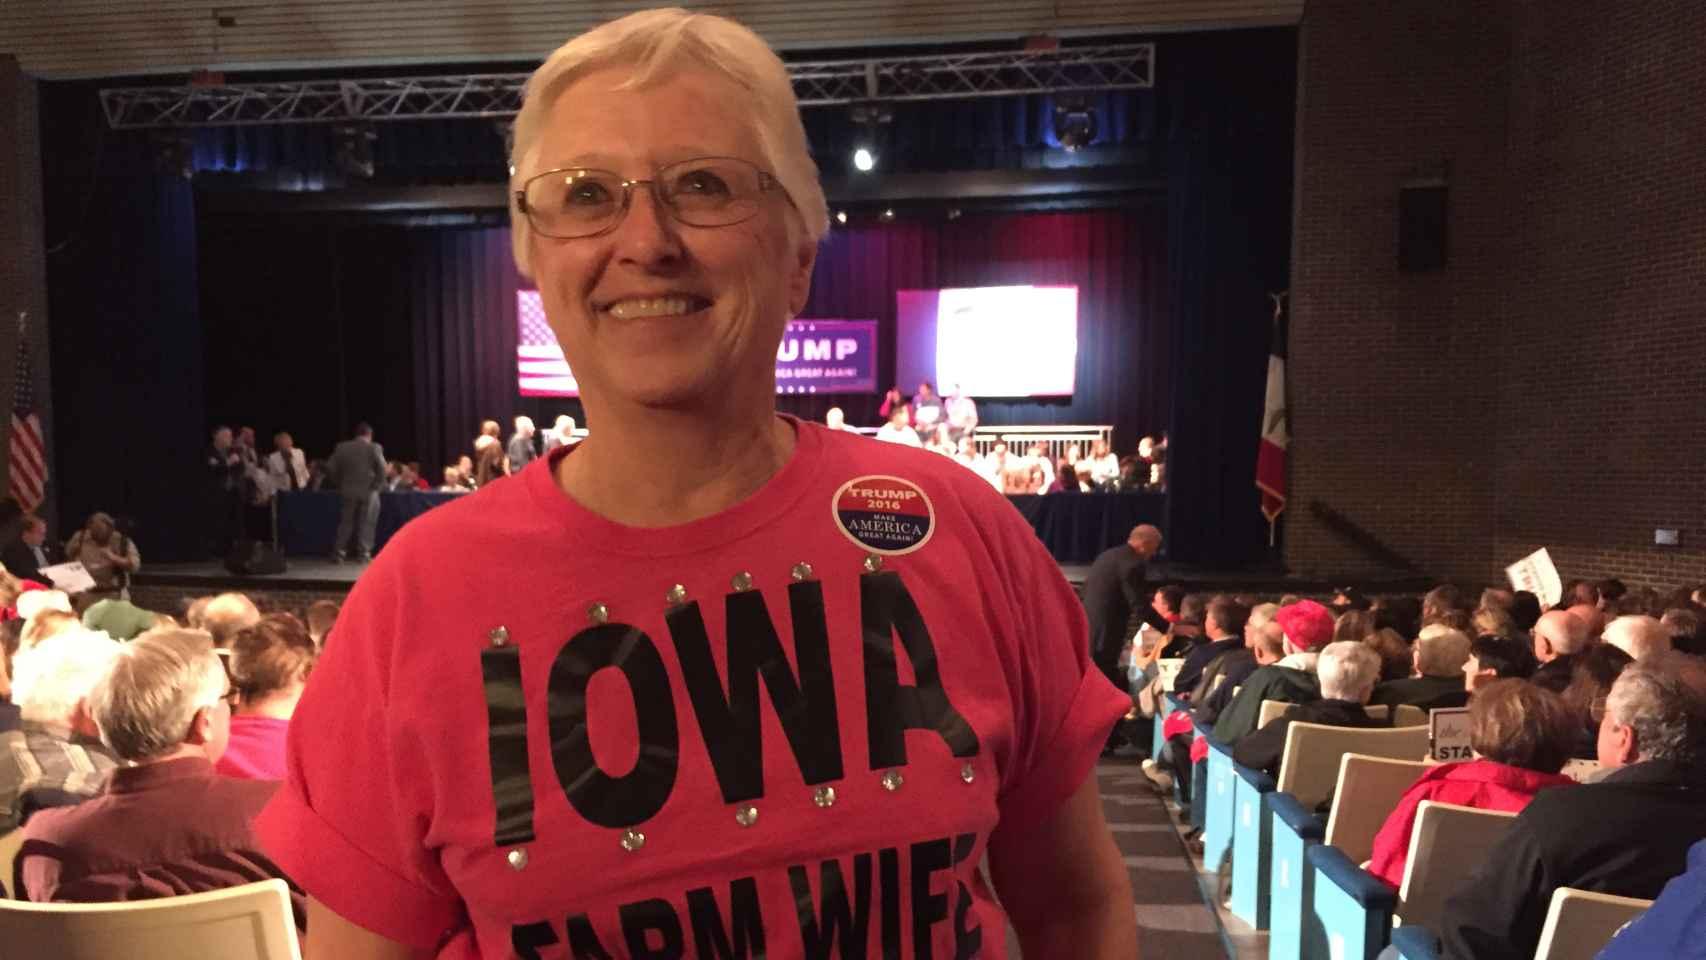 Dianne Jorgenson, seguidora de Trump.